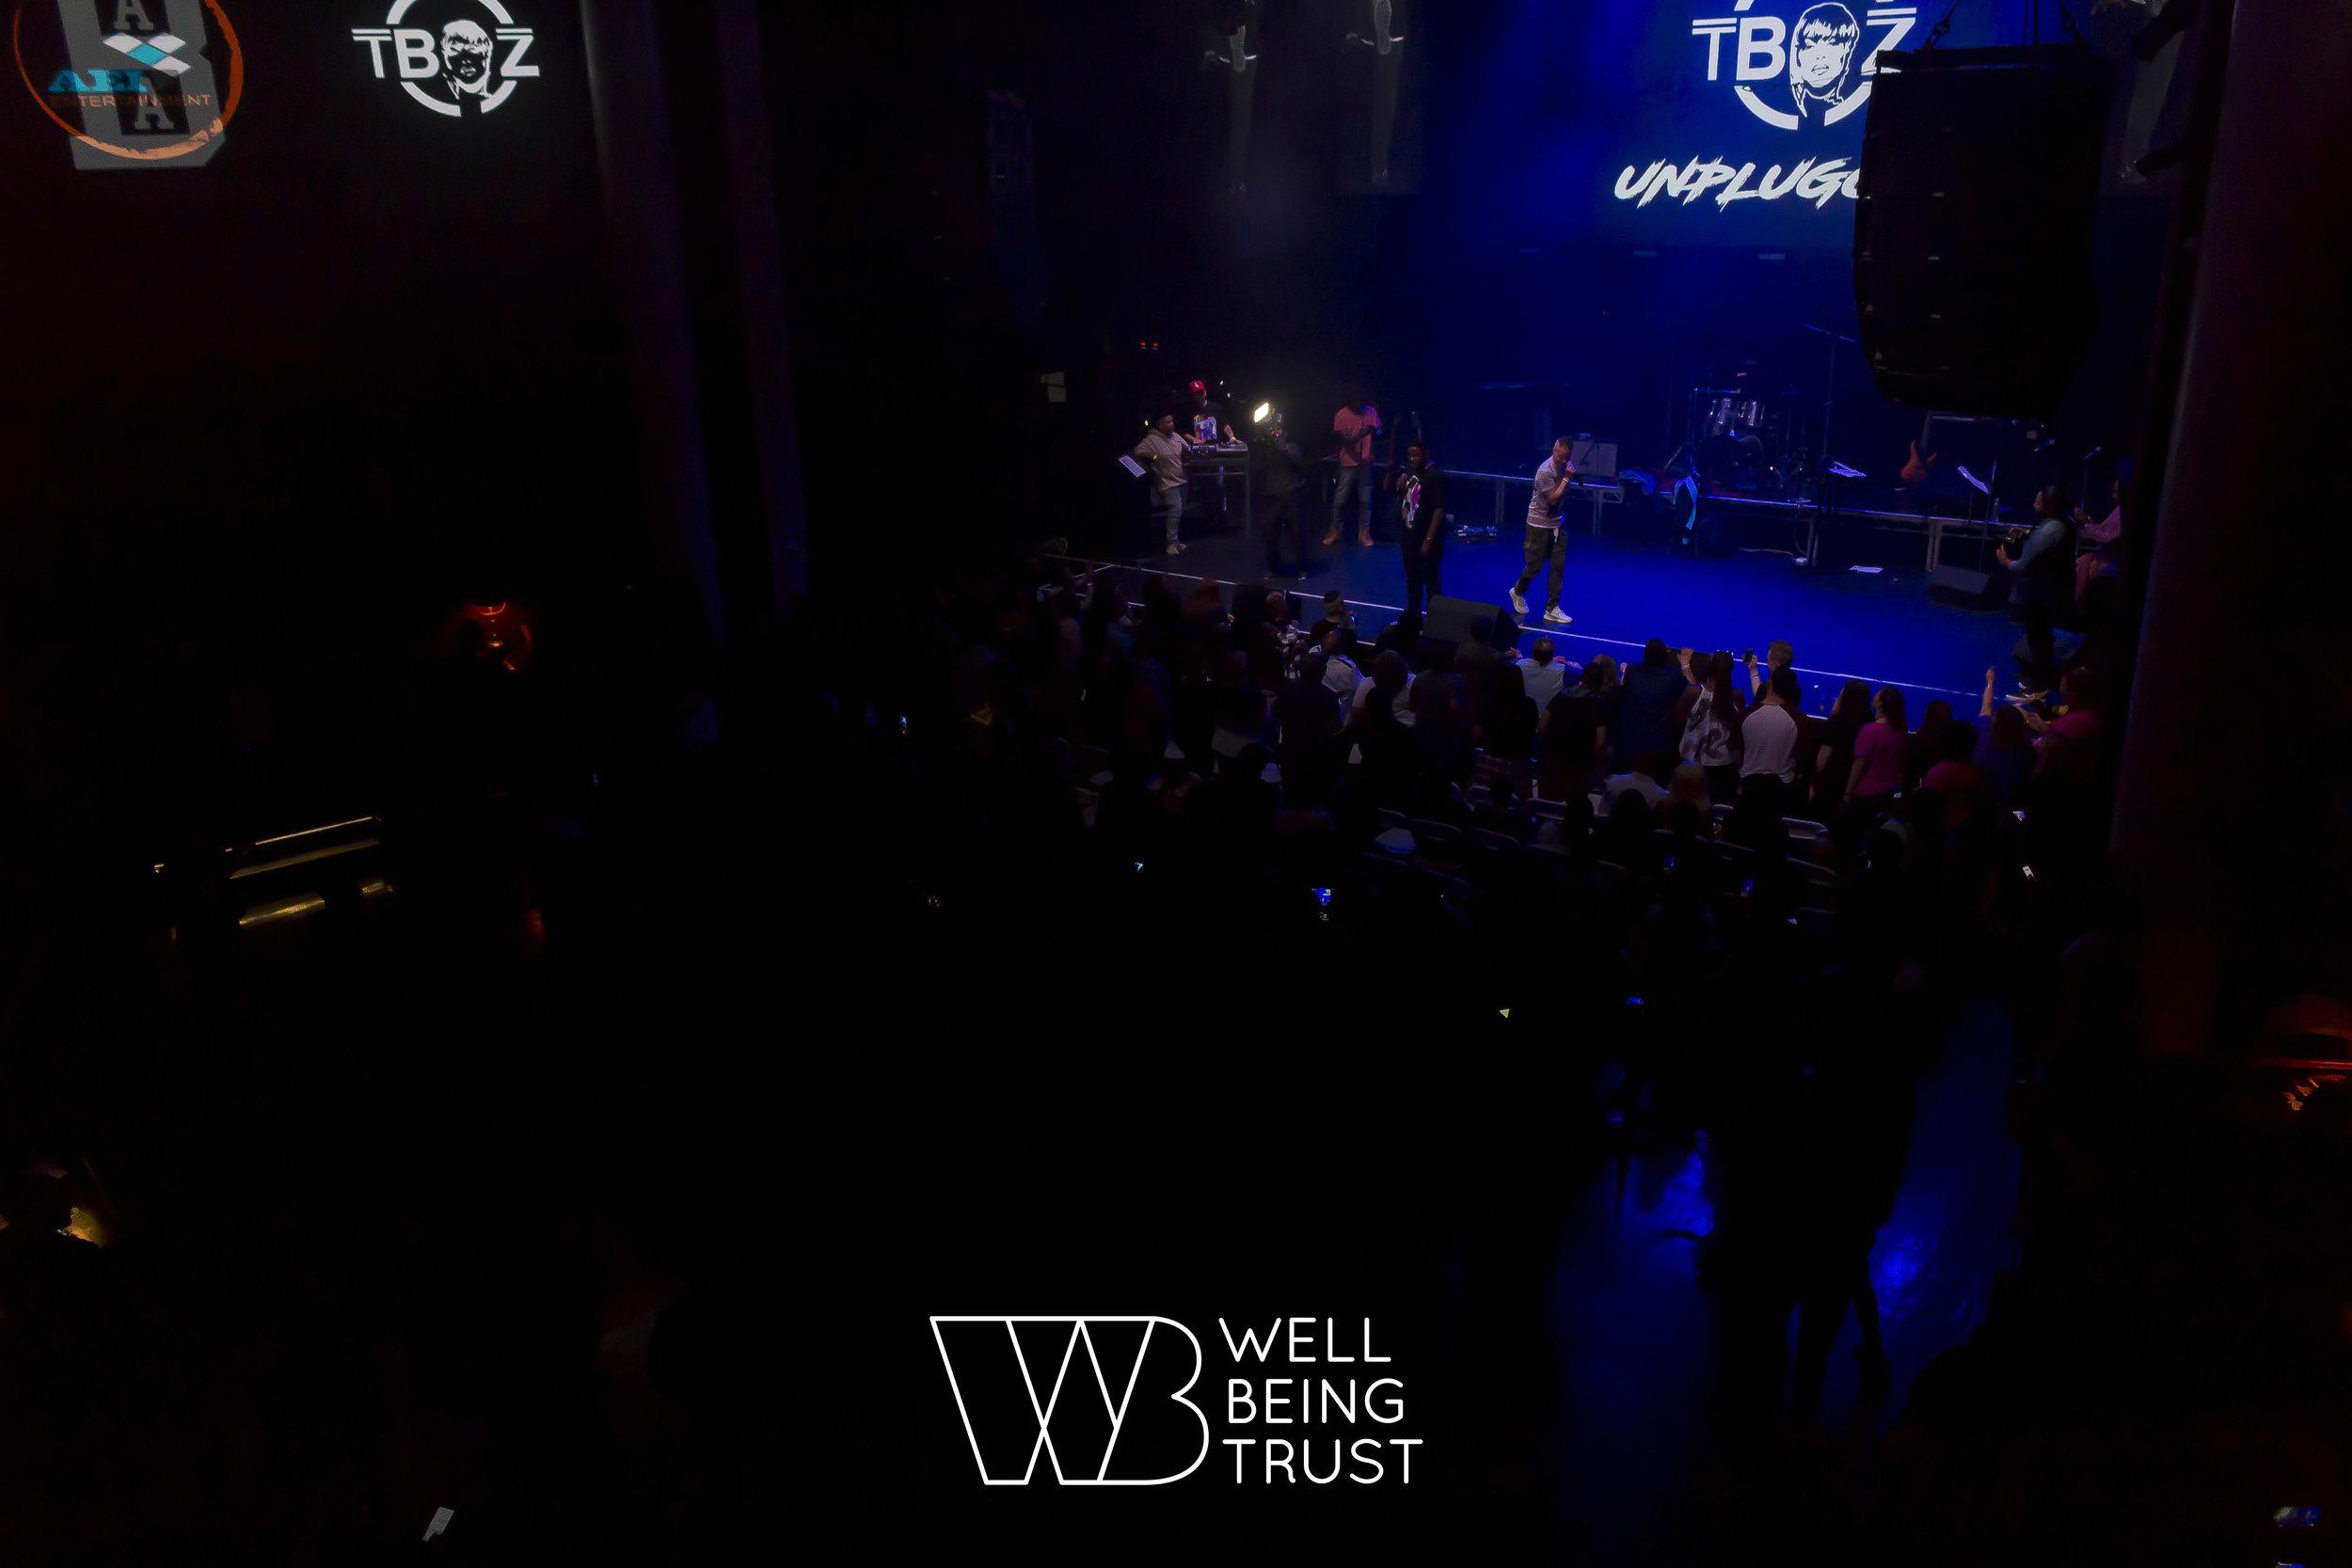 T-Boz Unplugged 2018_62.jpg